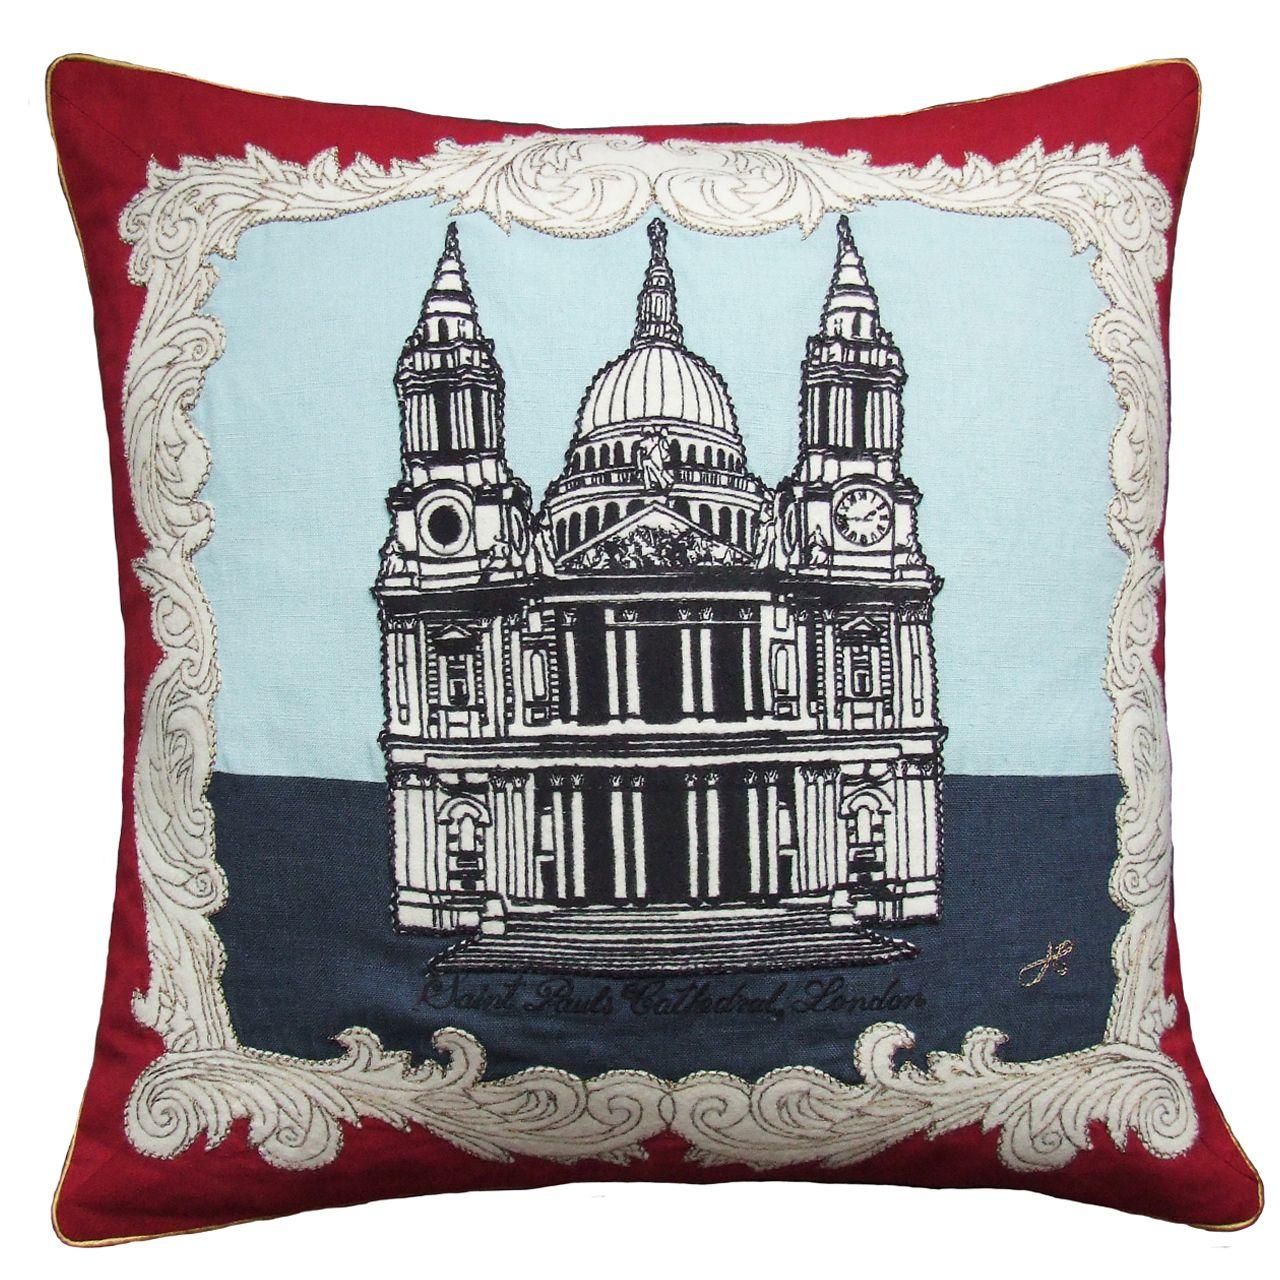 Pin By Beverley Stellas On London Luxury Cushions Cushions Throw Pillows